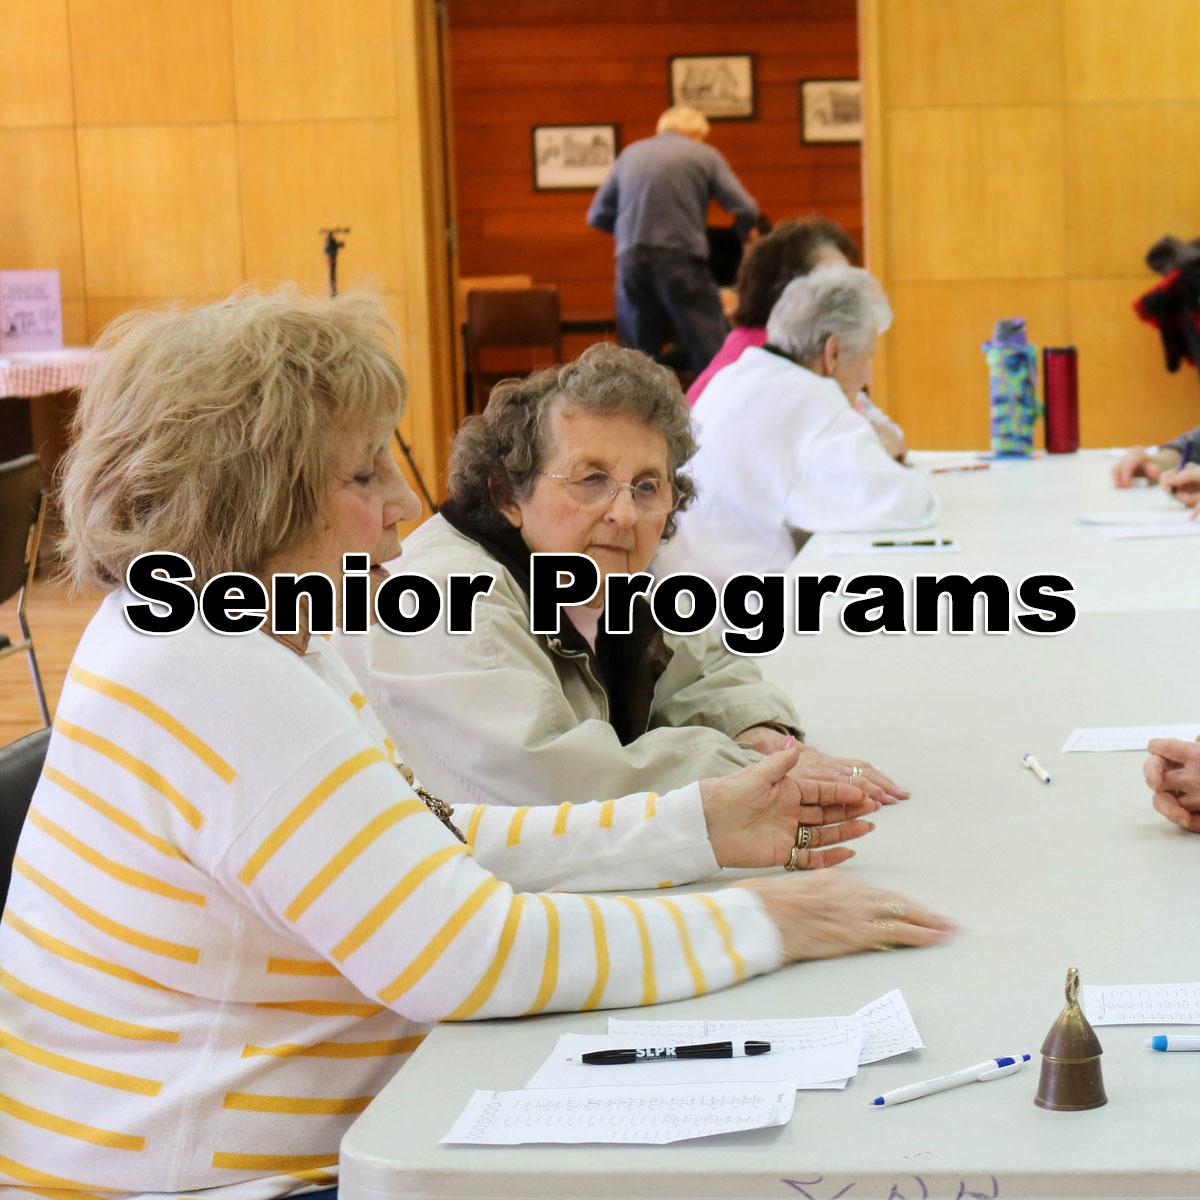 Senior Programs